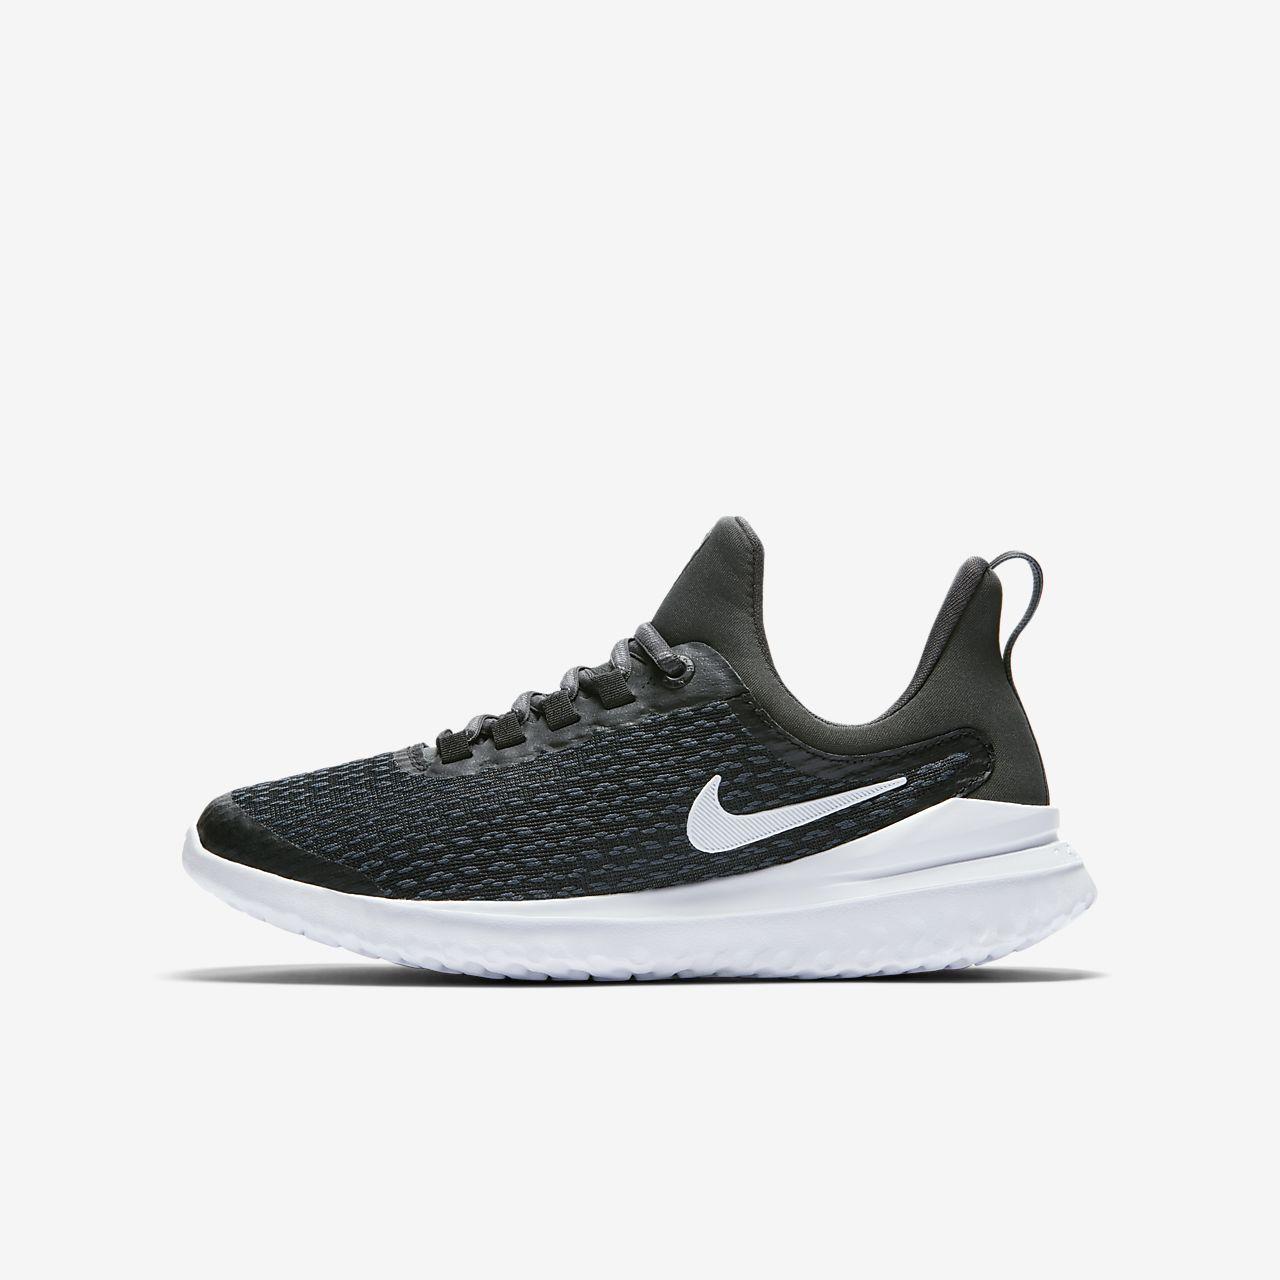 eb7ee7820d8a Nike Renew Rival Older Kids  Running Shoe. Nike.com GB